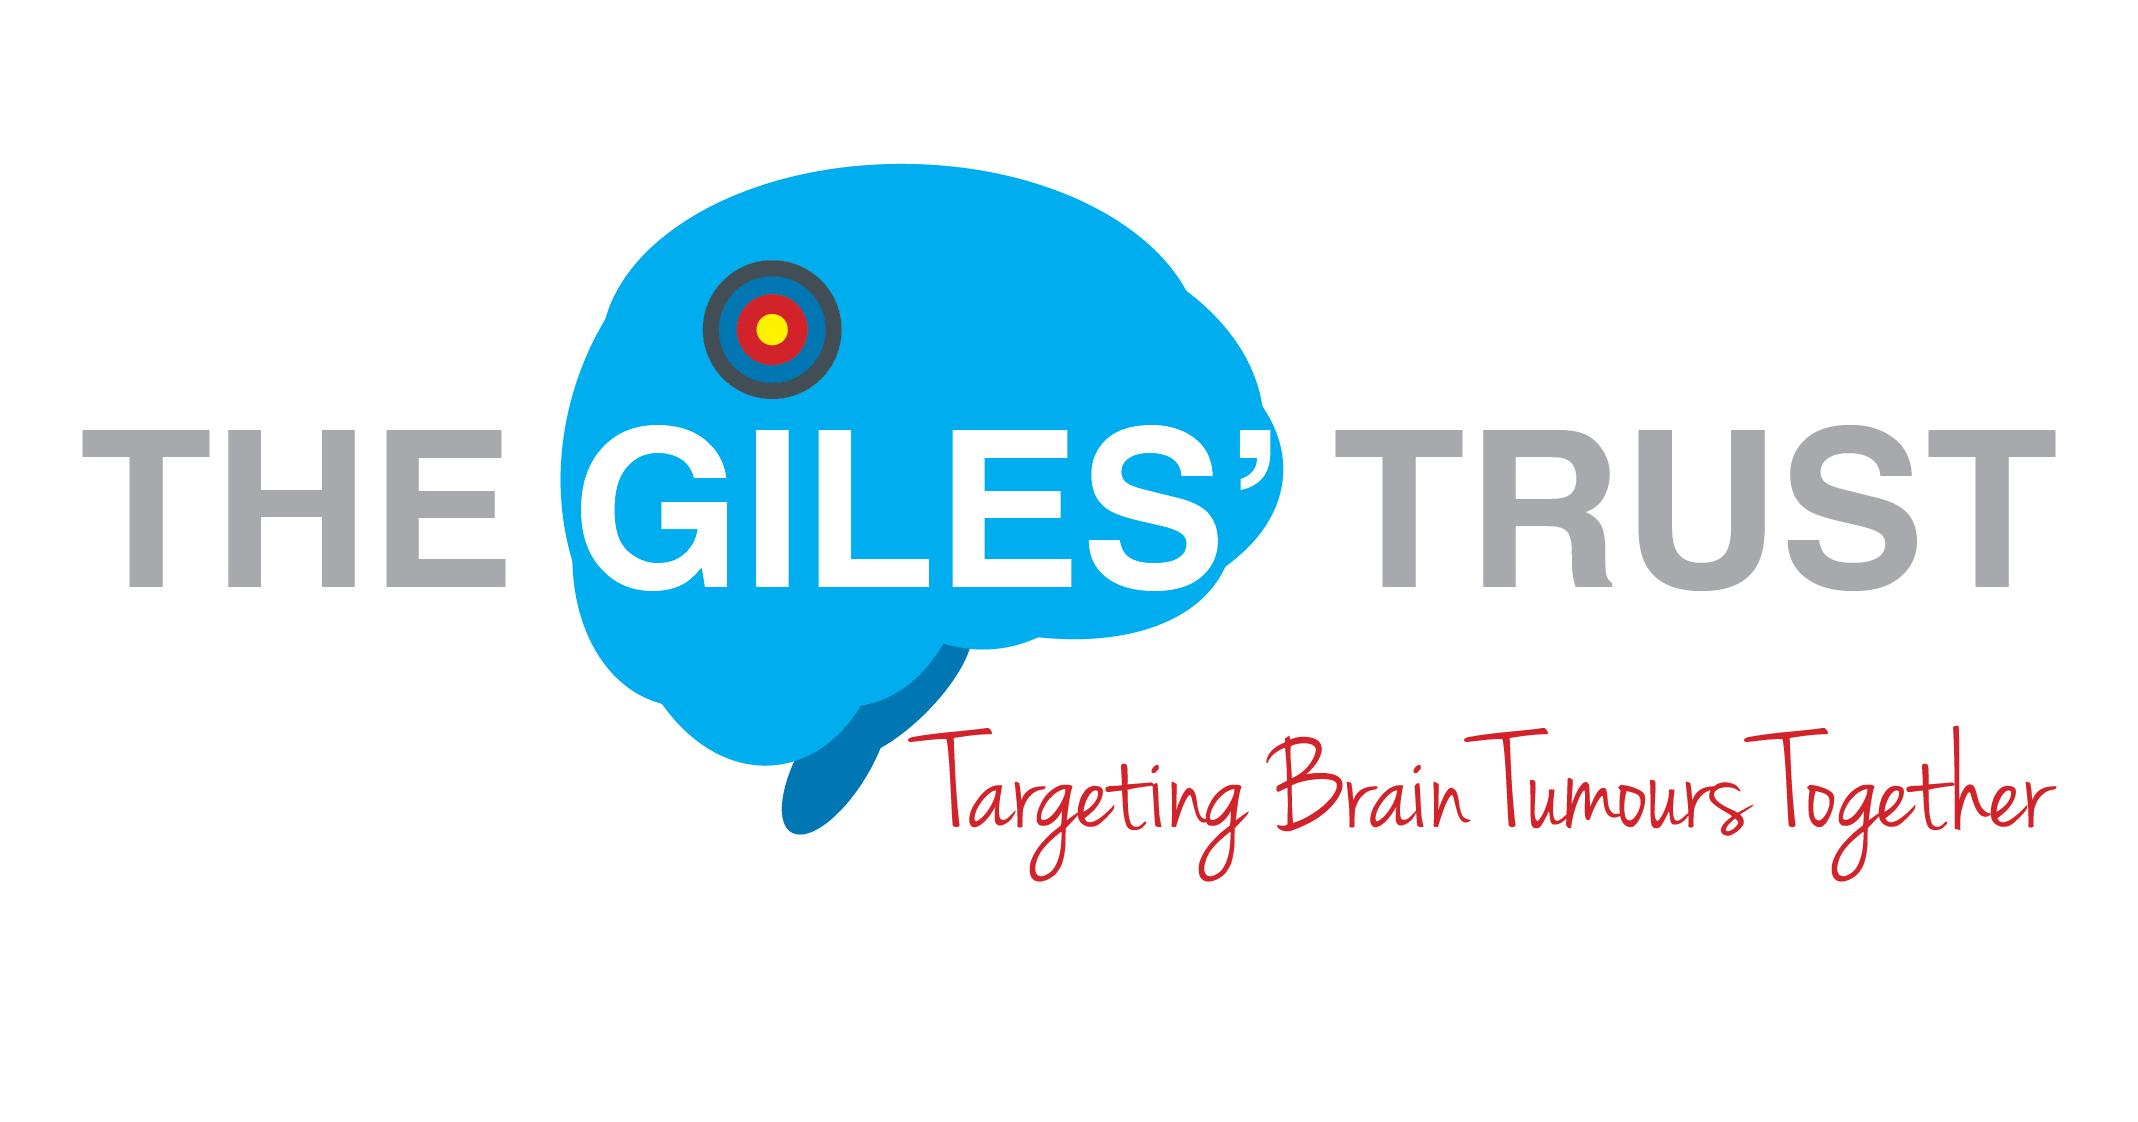 Giles trust logo